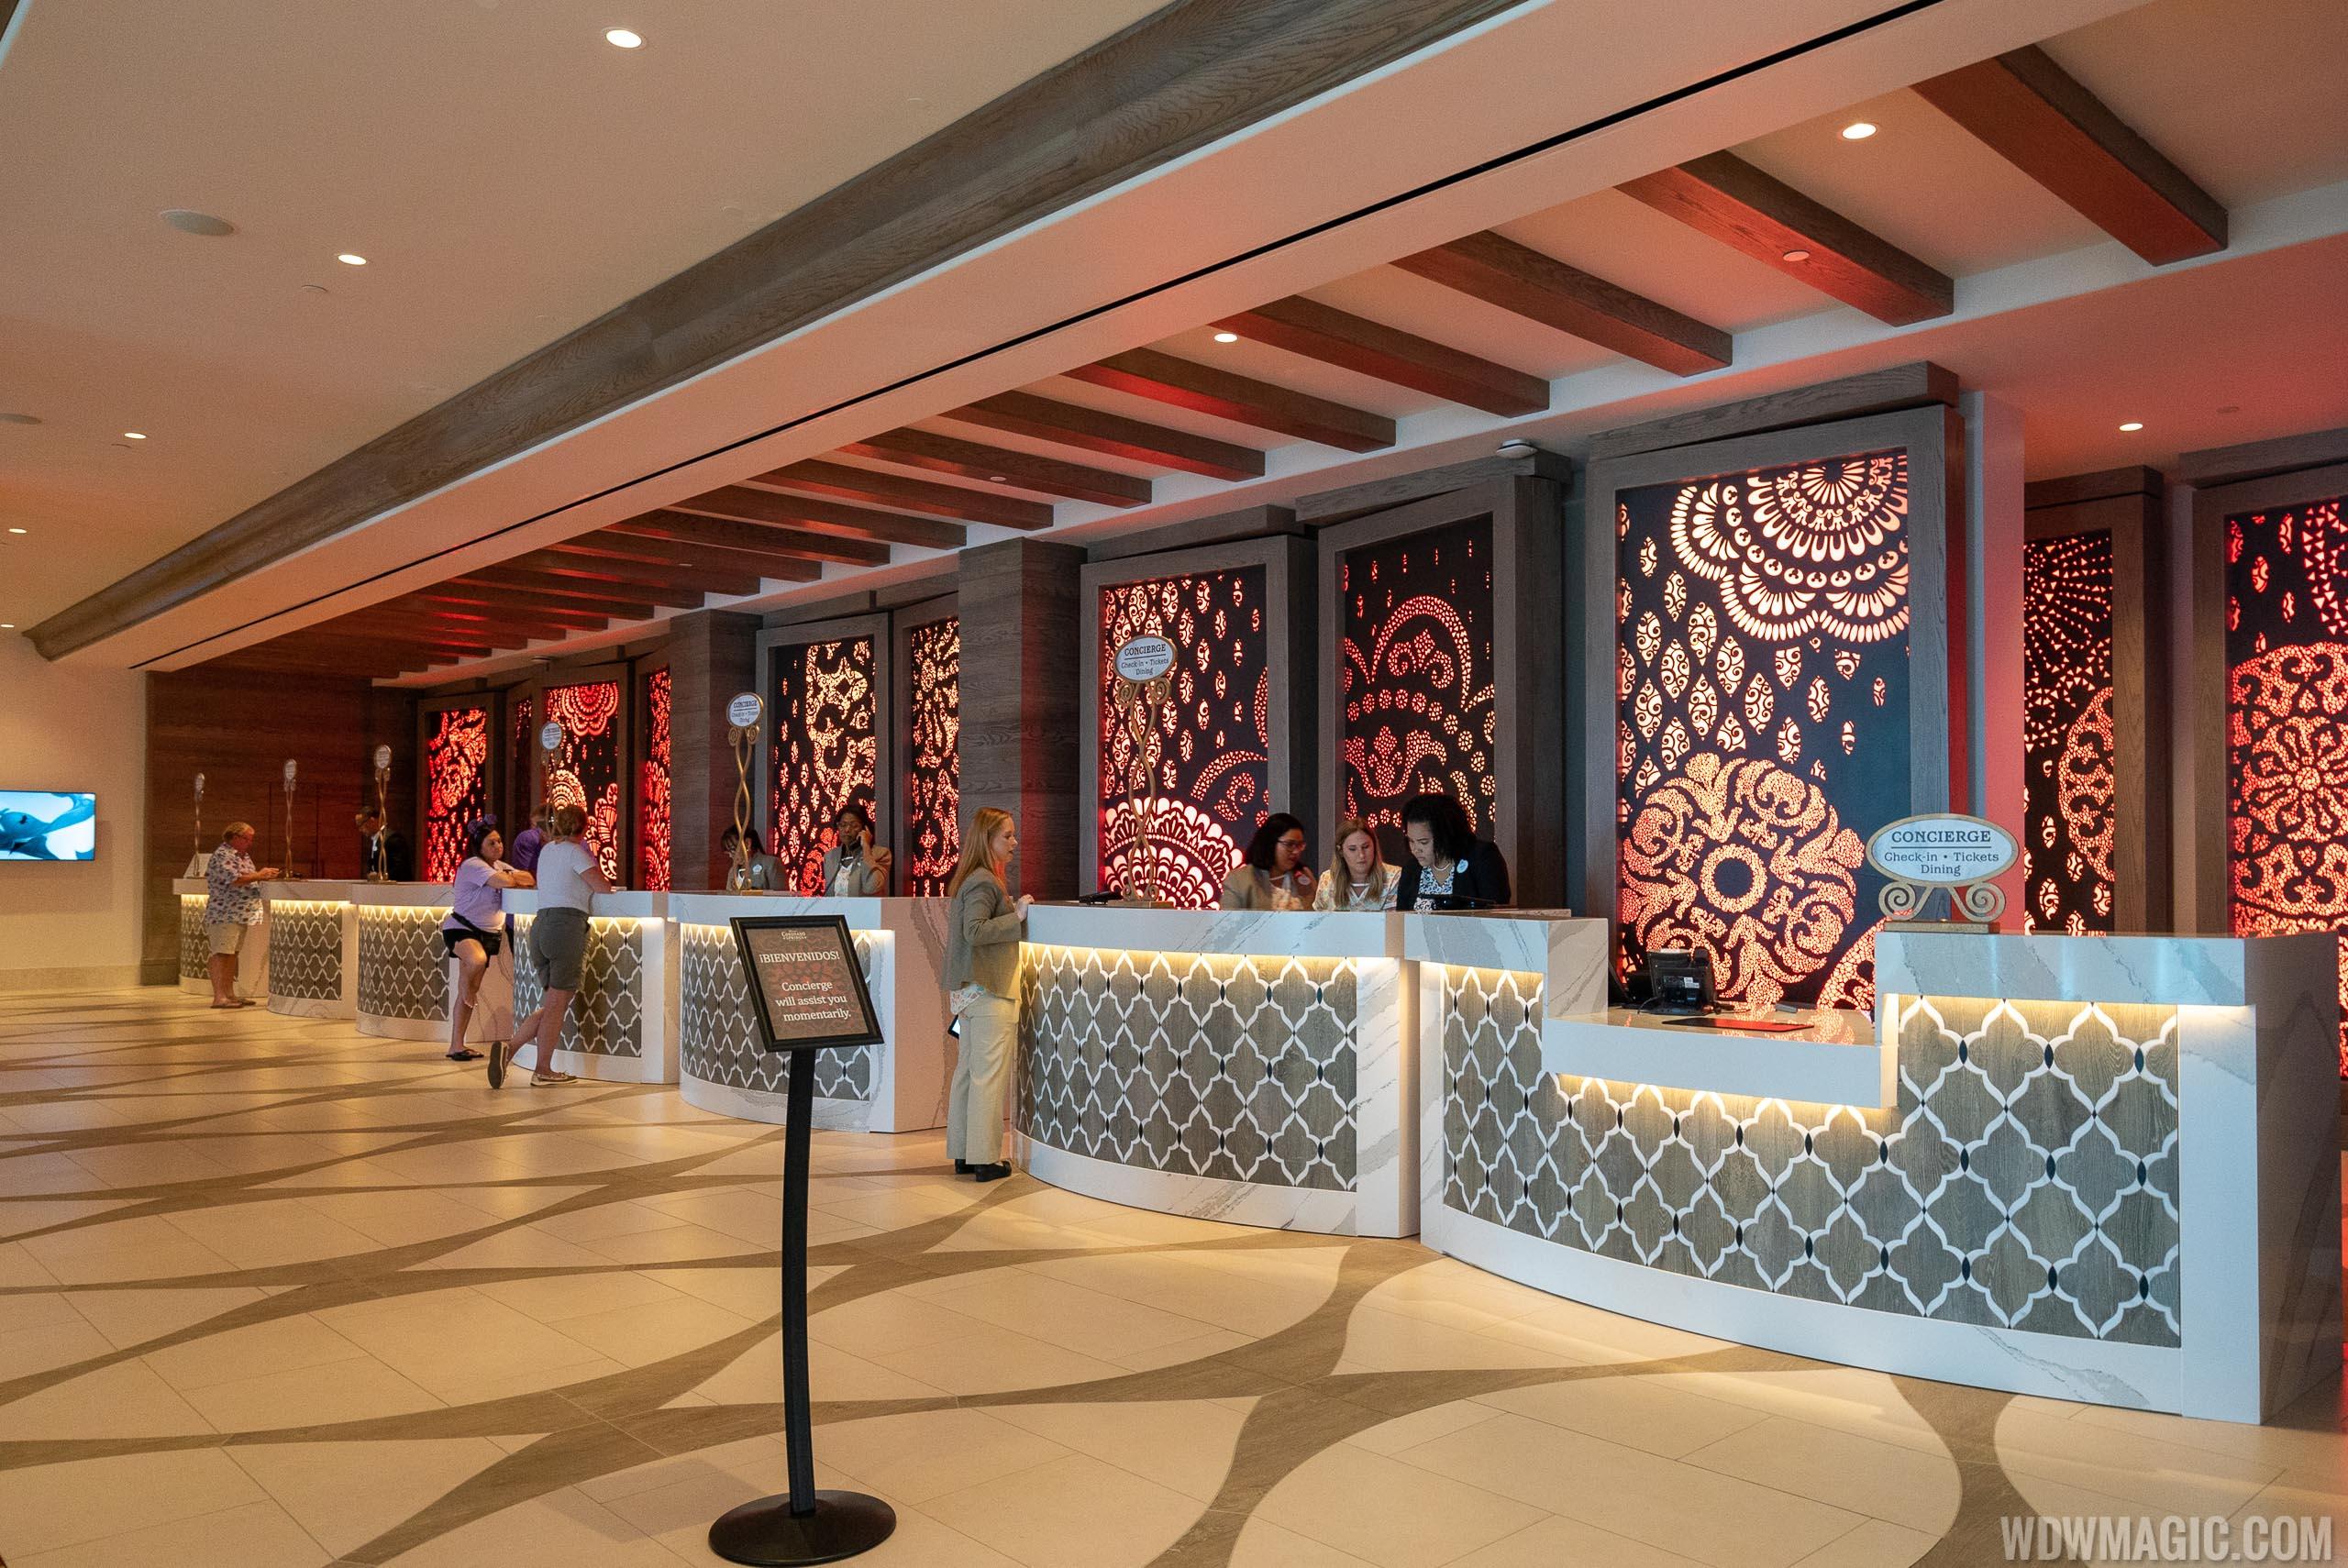 Disney's Coronado Springs Gran Destino - Check In Desks